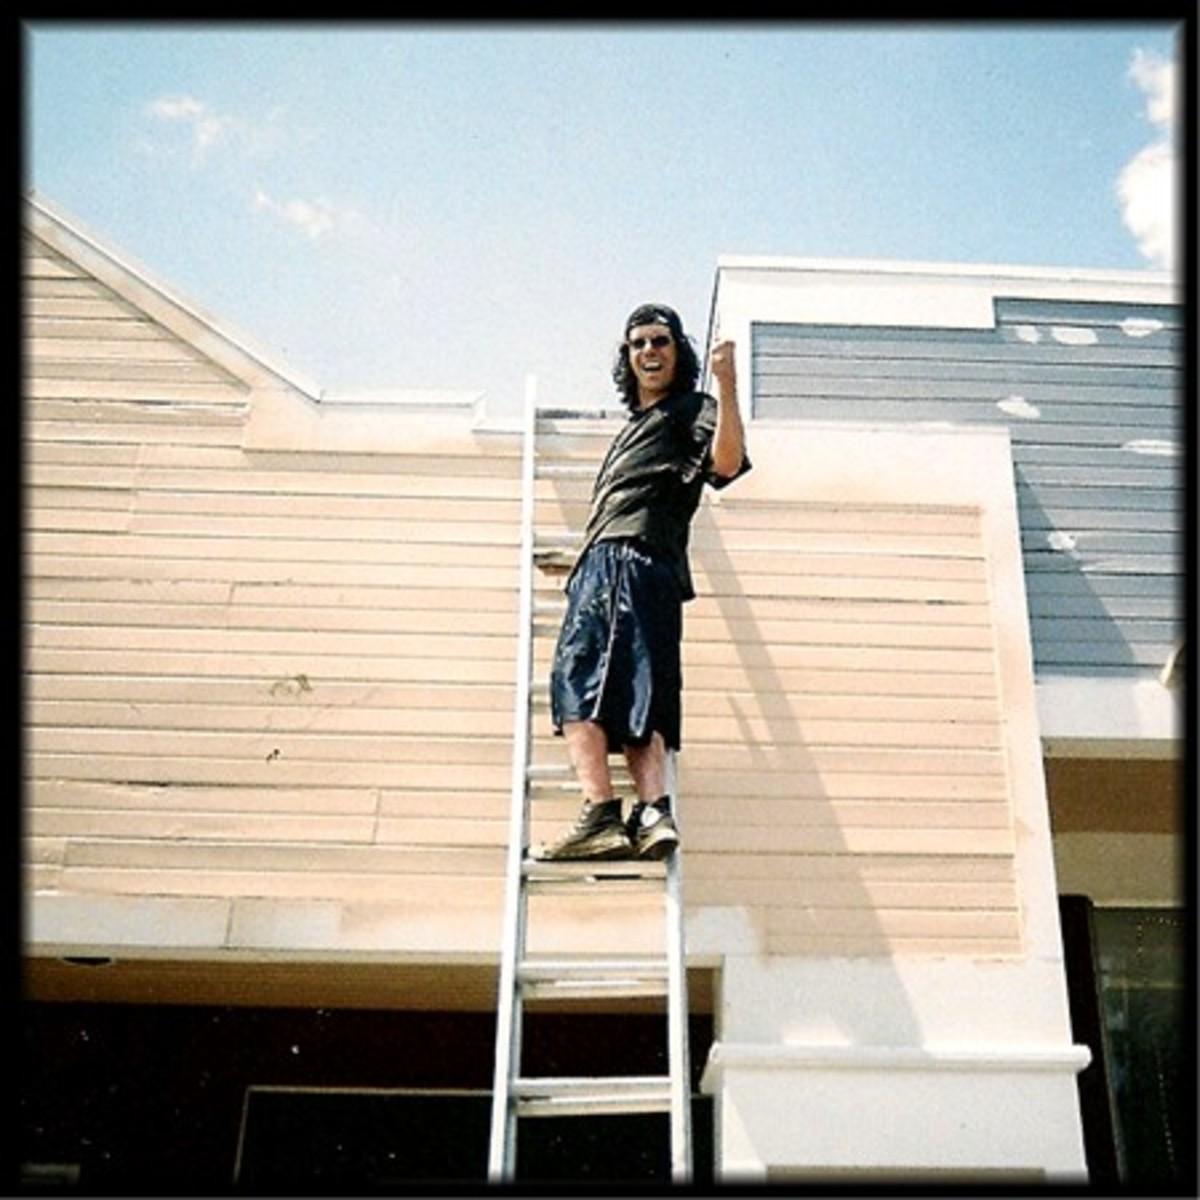 Able to Climb Tall Ladders Again